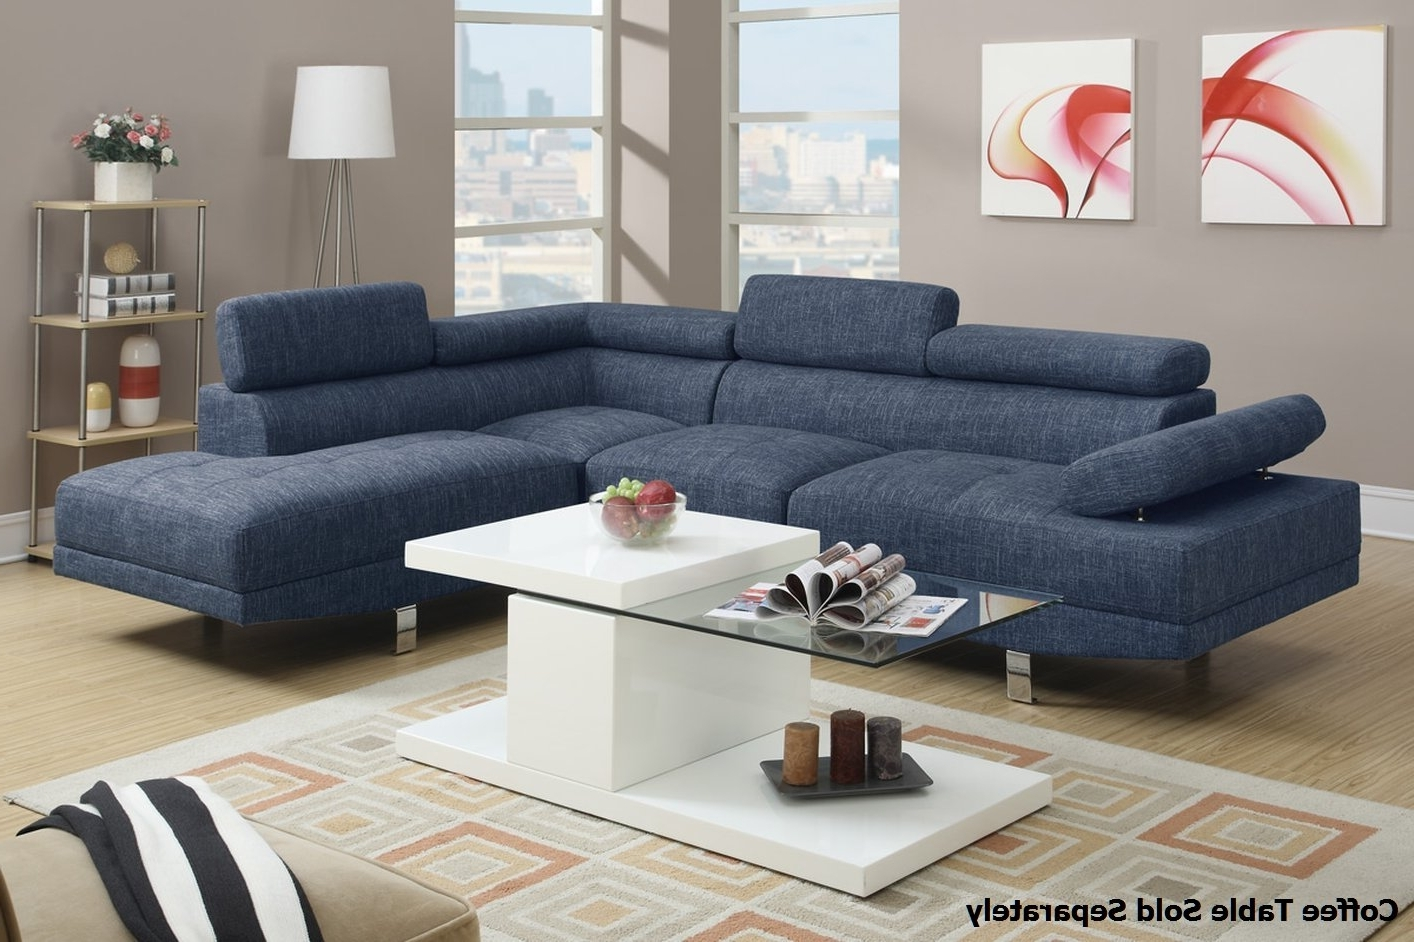 Favorite Sofas Centerectionalofa Blue Velvet Denim Navy Houston Texas Regarding Houston Sectional Sofas (View 10 of 15)